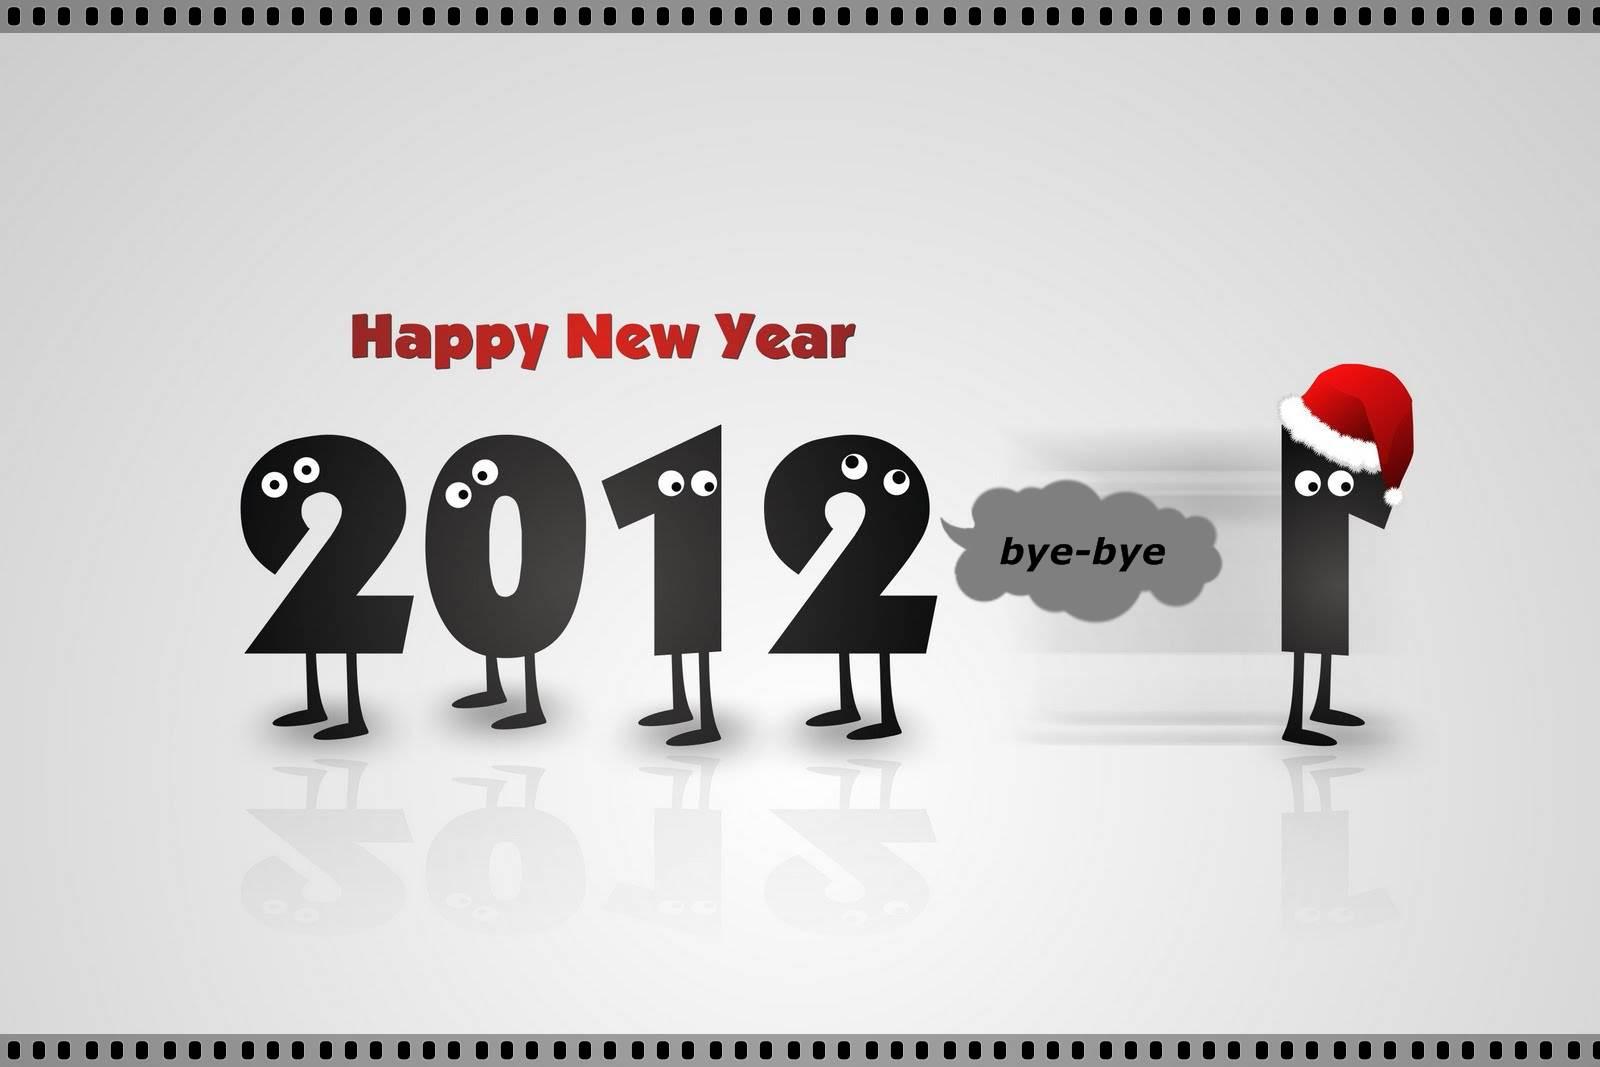 happy 2012 new year me mythrills